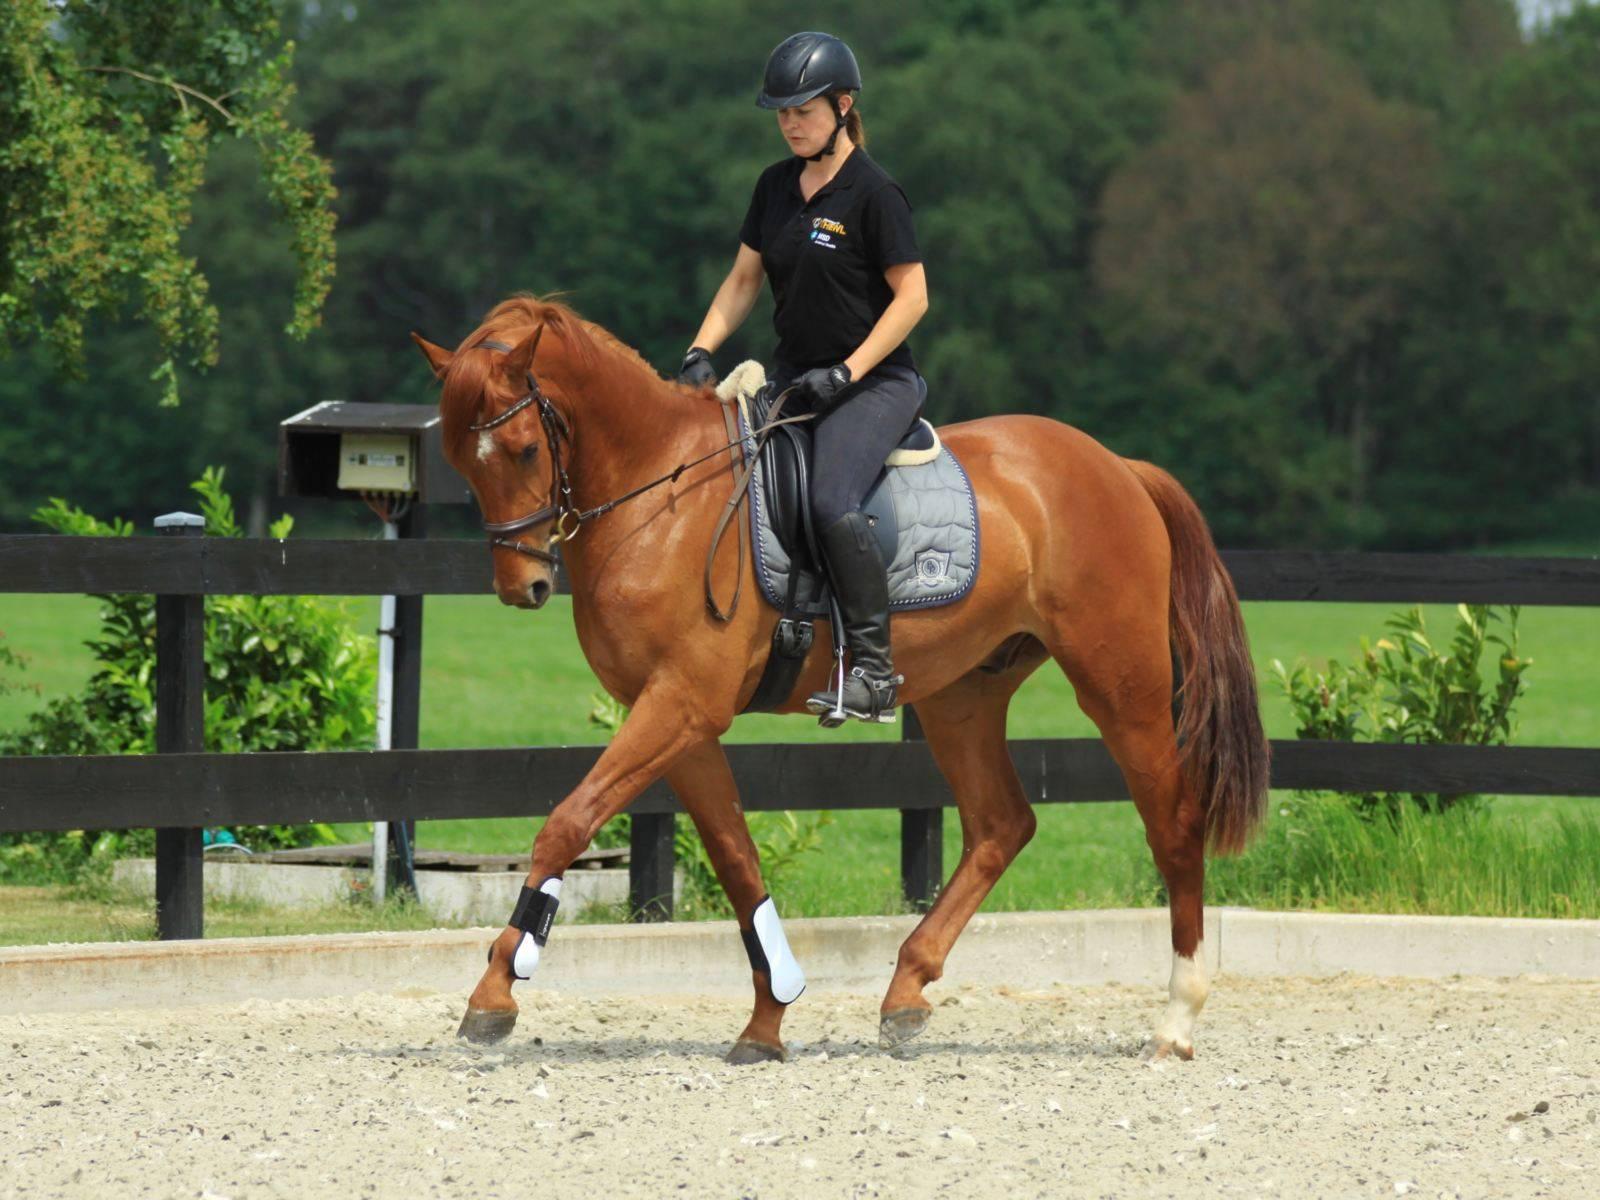 Dutch Dressage Gelding for Sale in the Netherlands